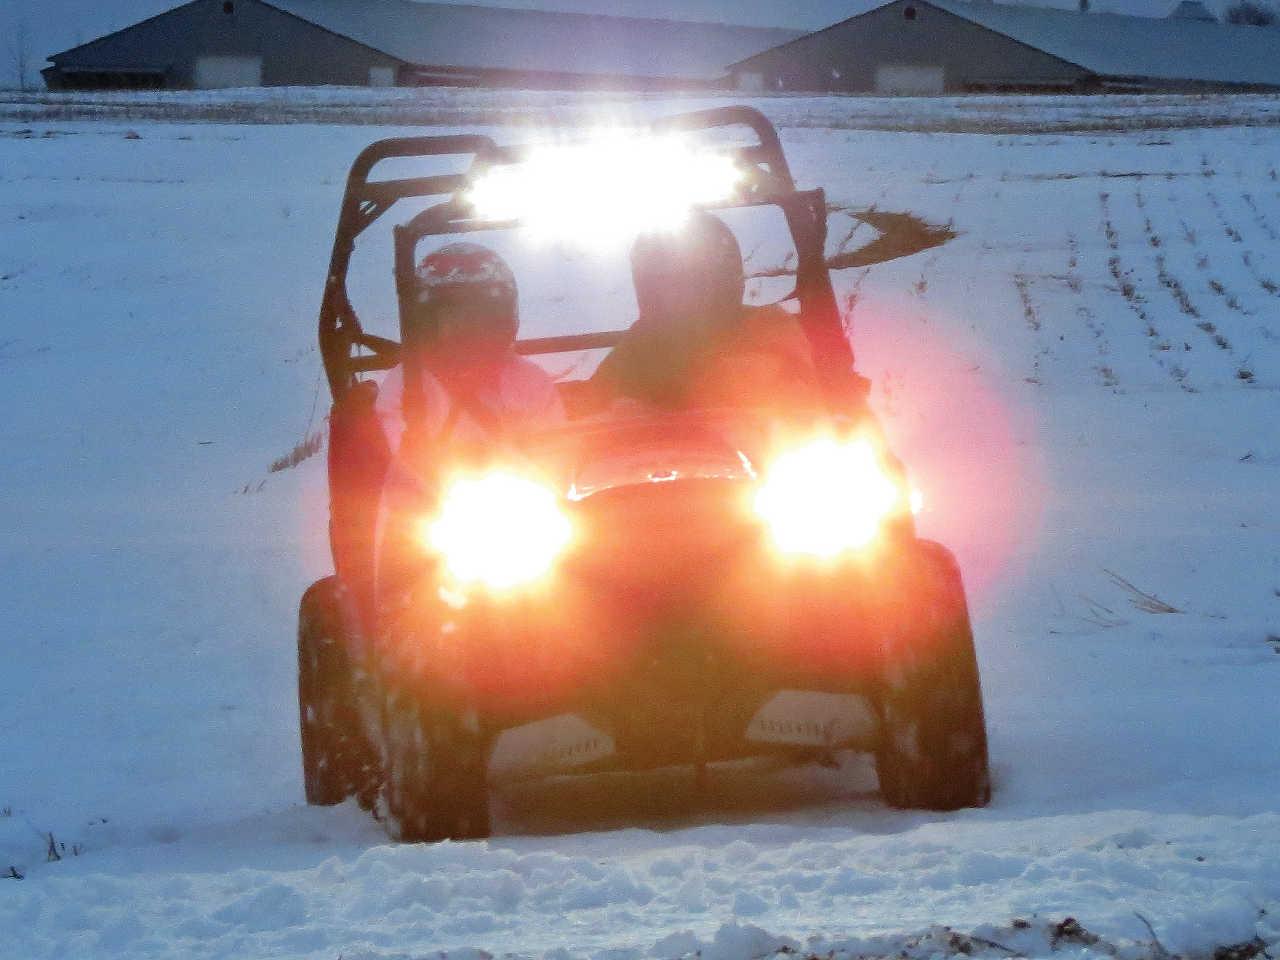 vendor.2014.seizmik.led-lights.on-polaris-rzr.in-snow.jpeg